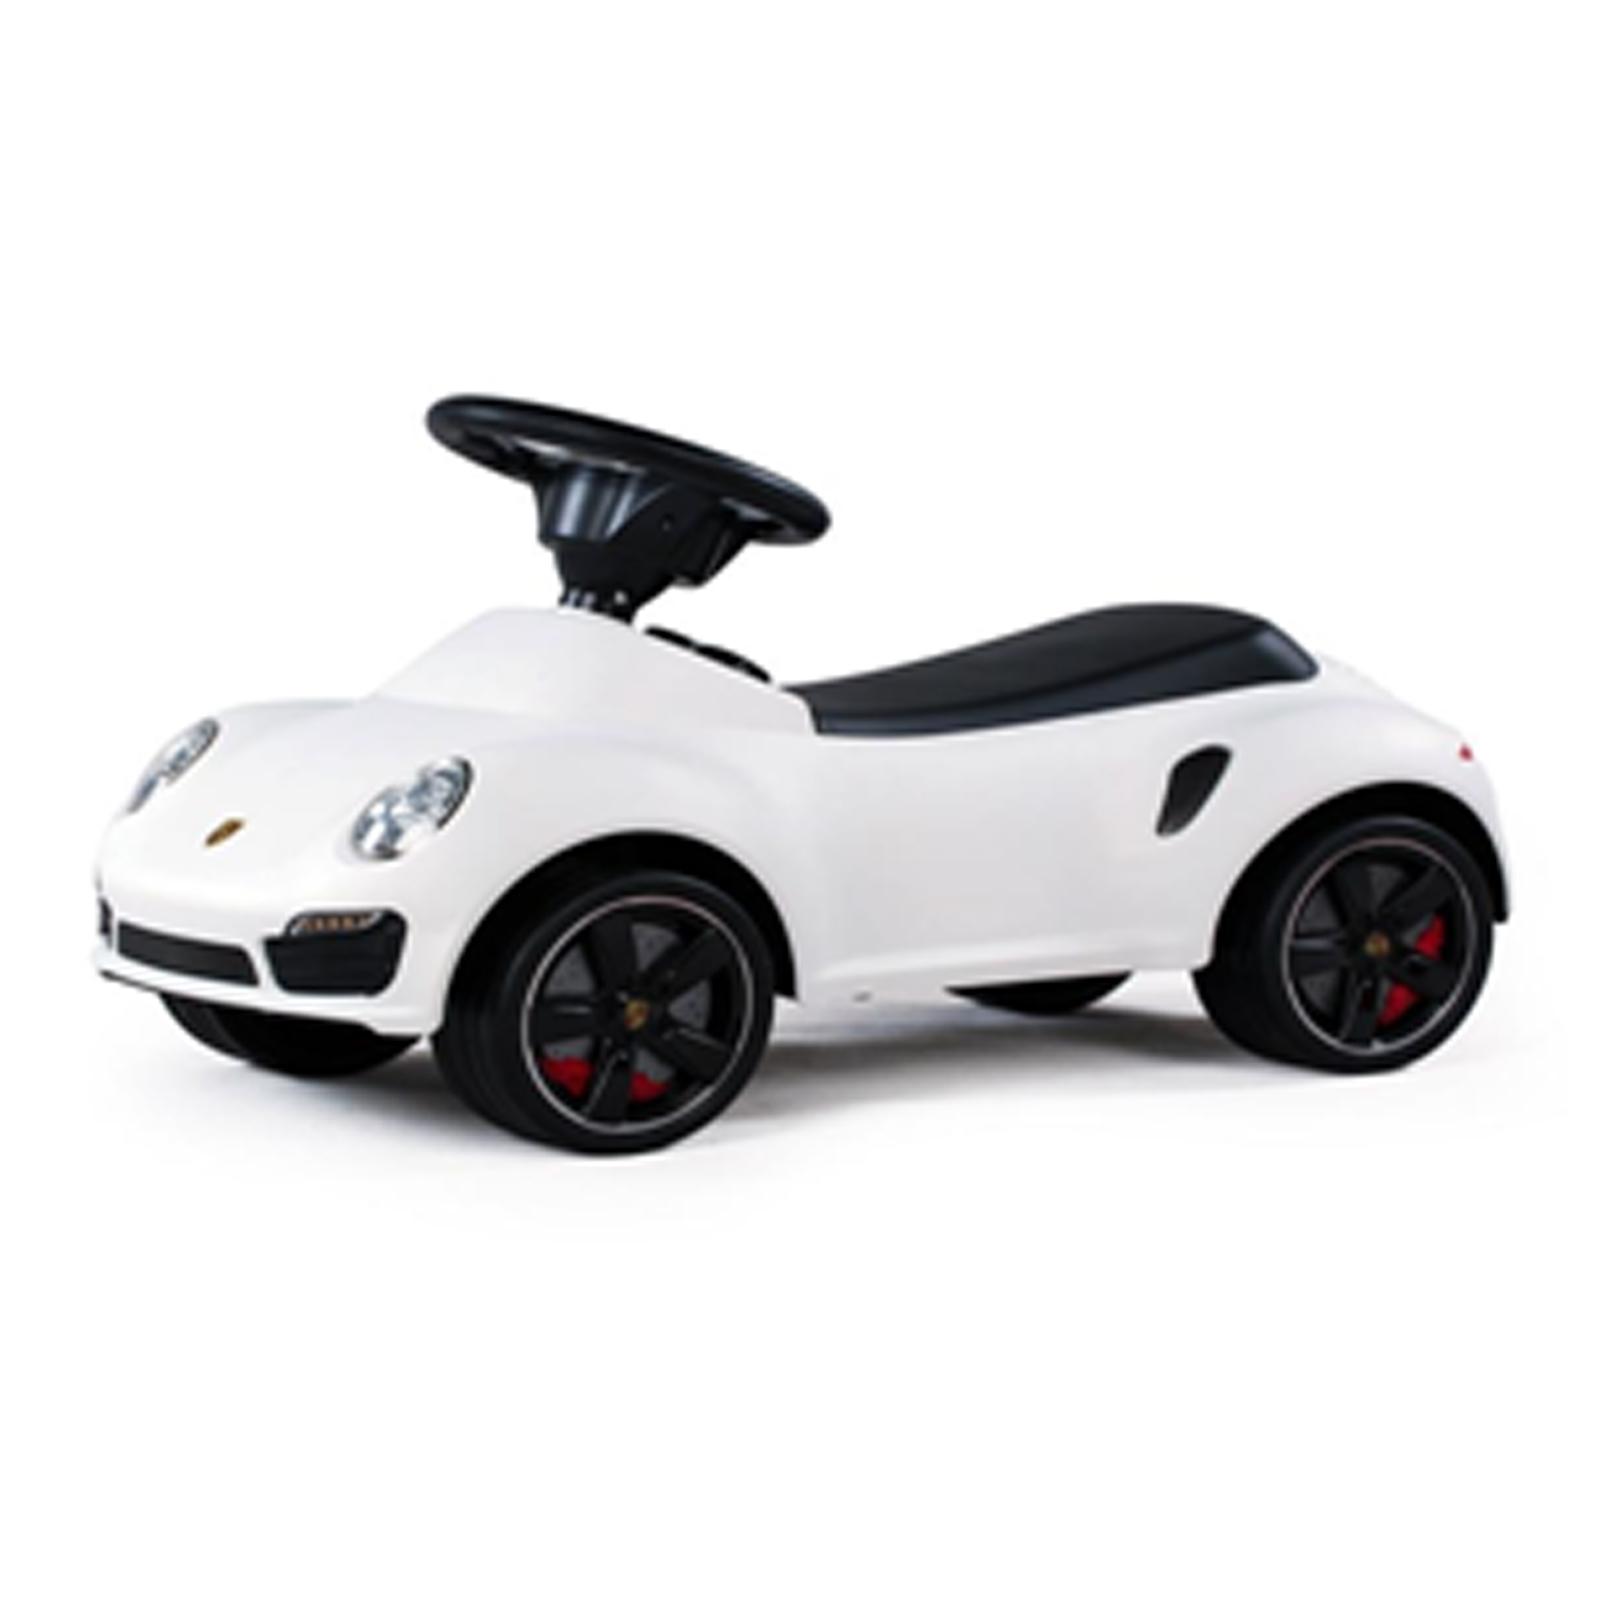 Licensed Porsche 911 Turbo Kids Ride On Push Car in White